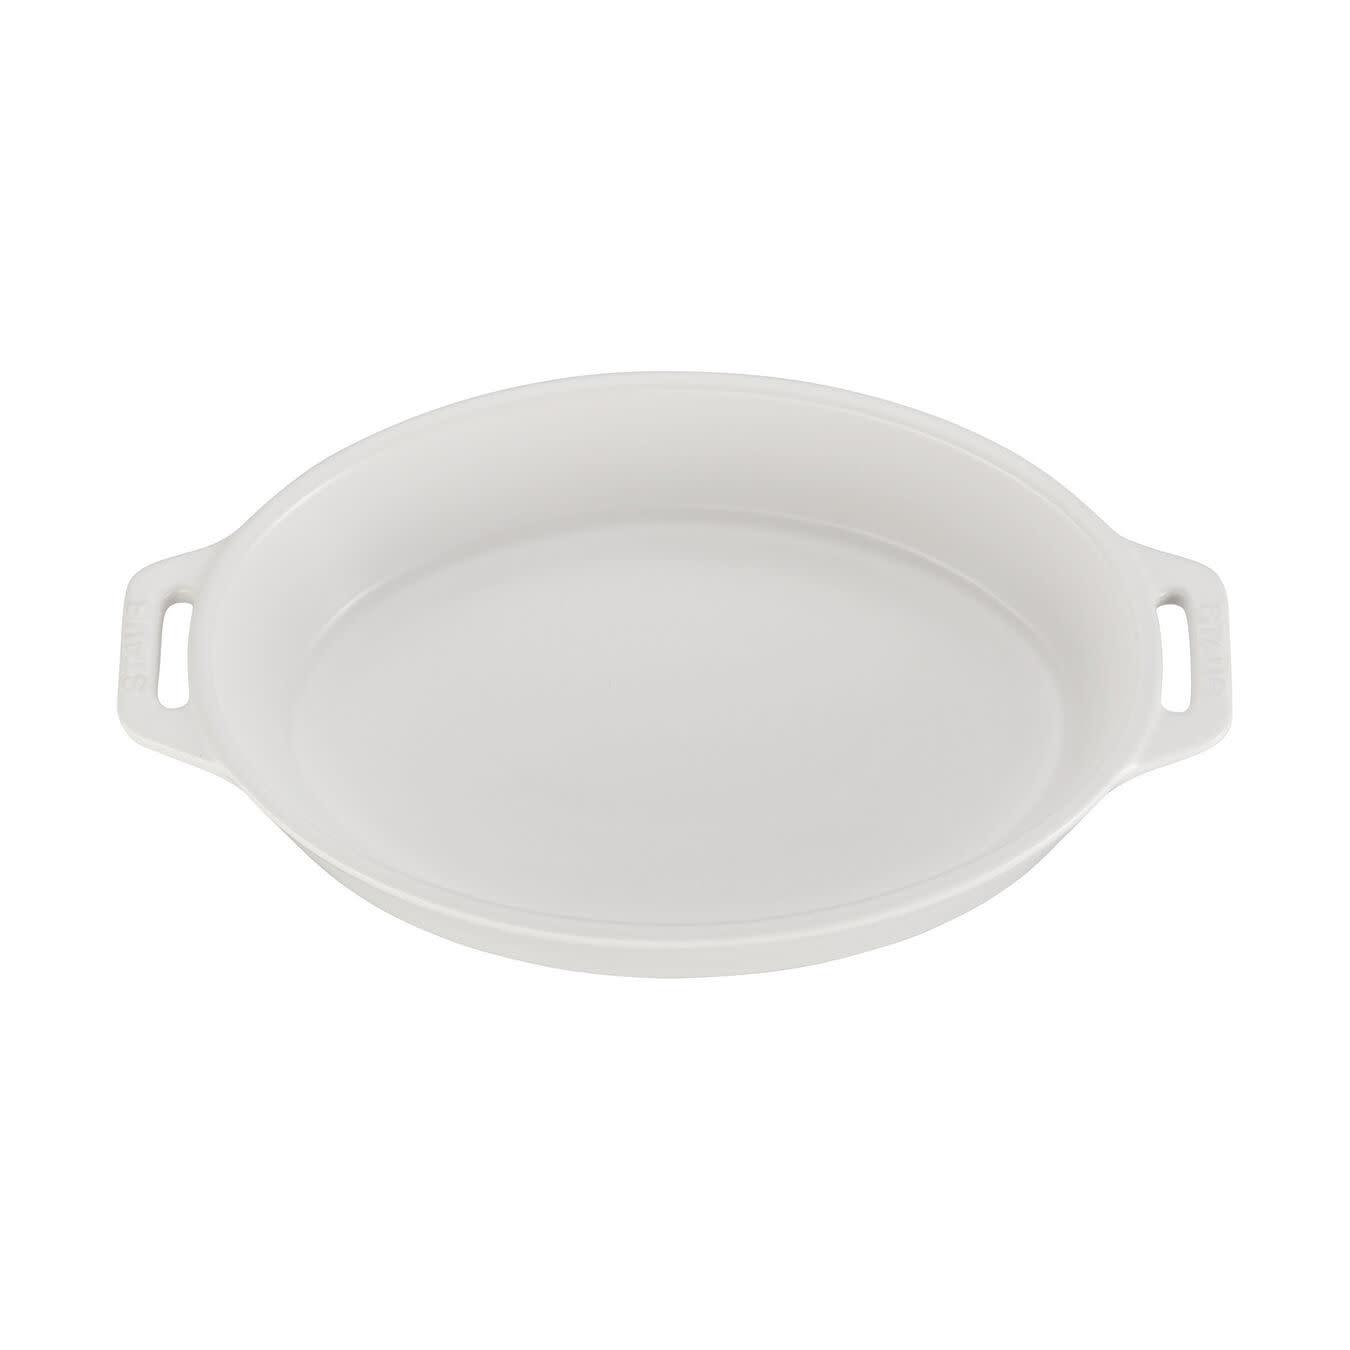 "Staub Oval Baking Dish Matte White 15x23cm /9""x6"""